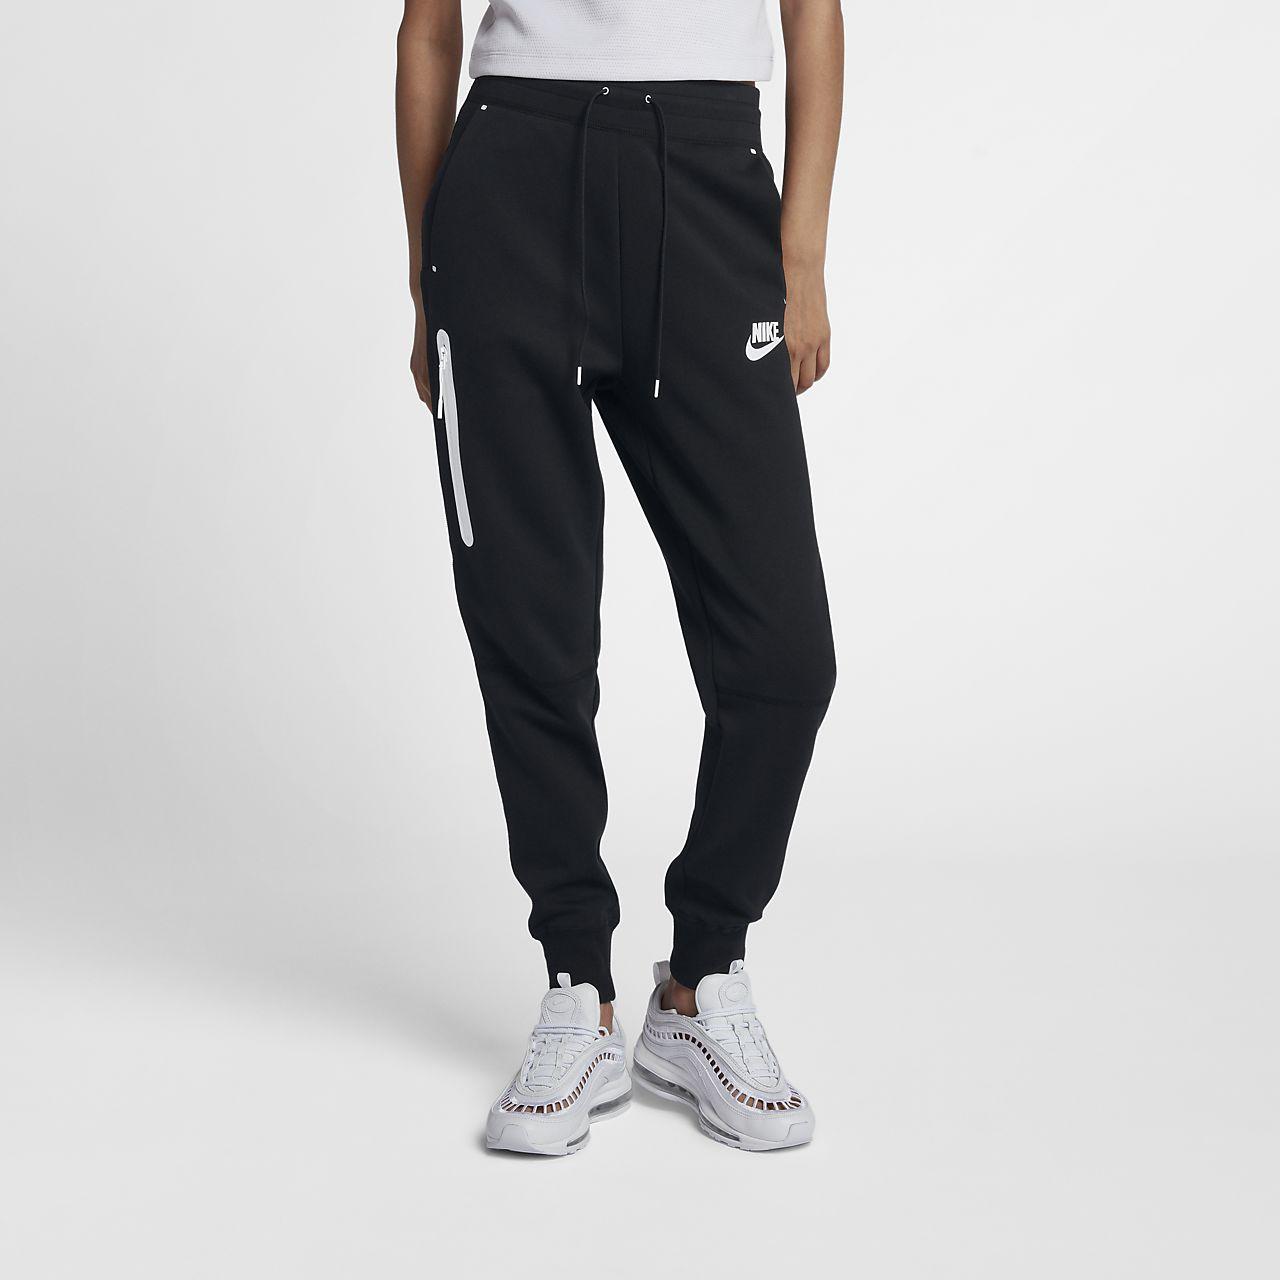 98514b5739 Pantalon Nike Sportswear Tech Fleece pour Femme. Nike.com CA